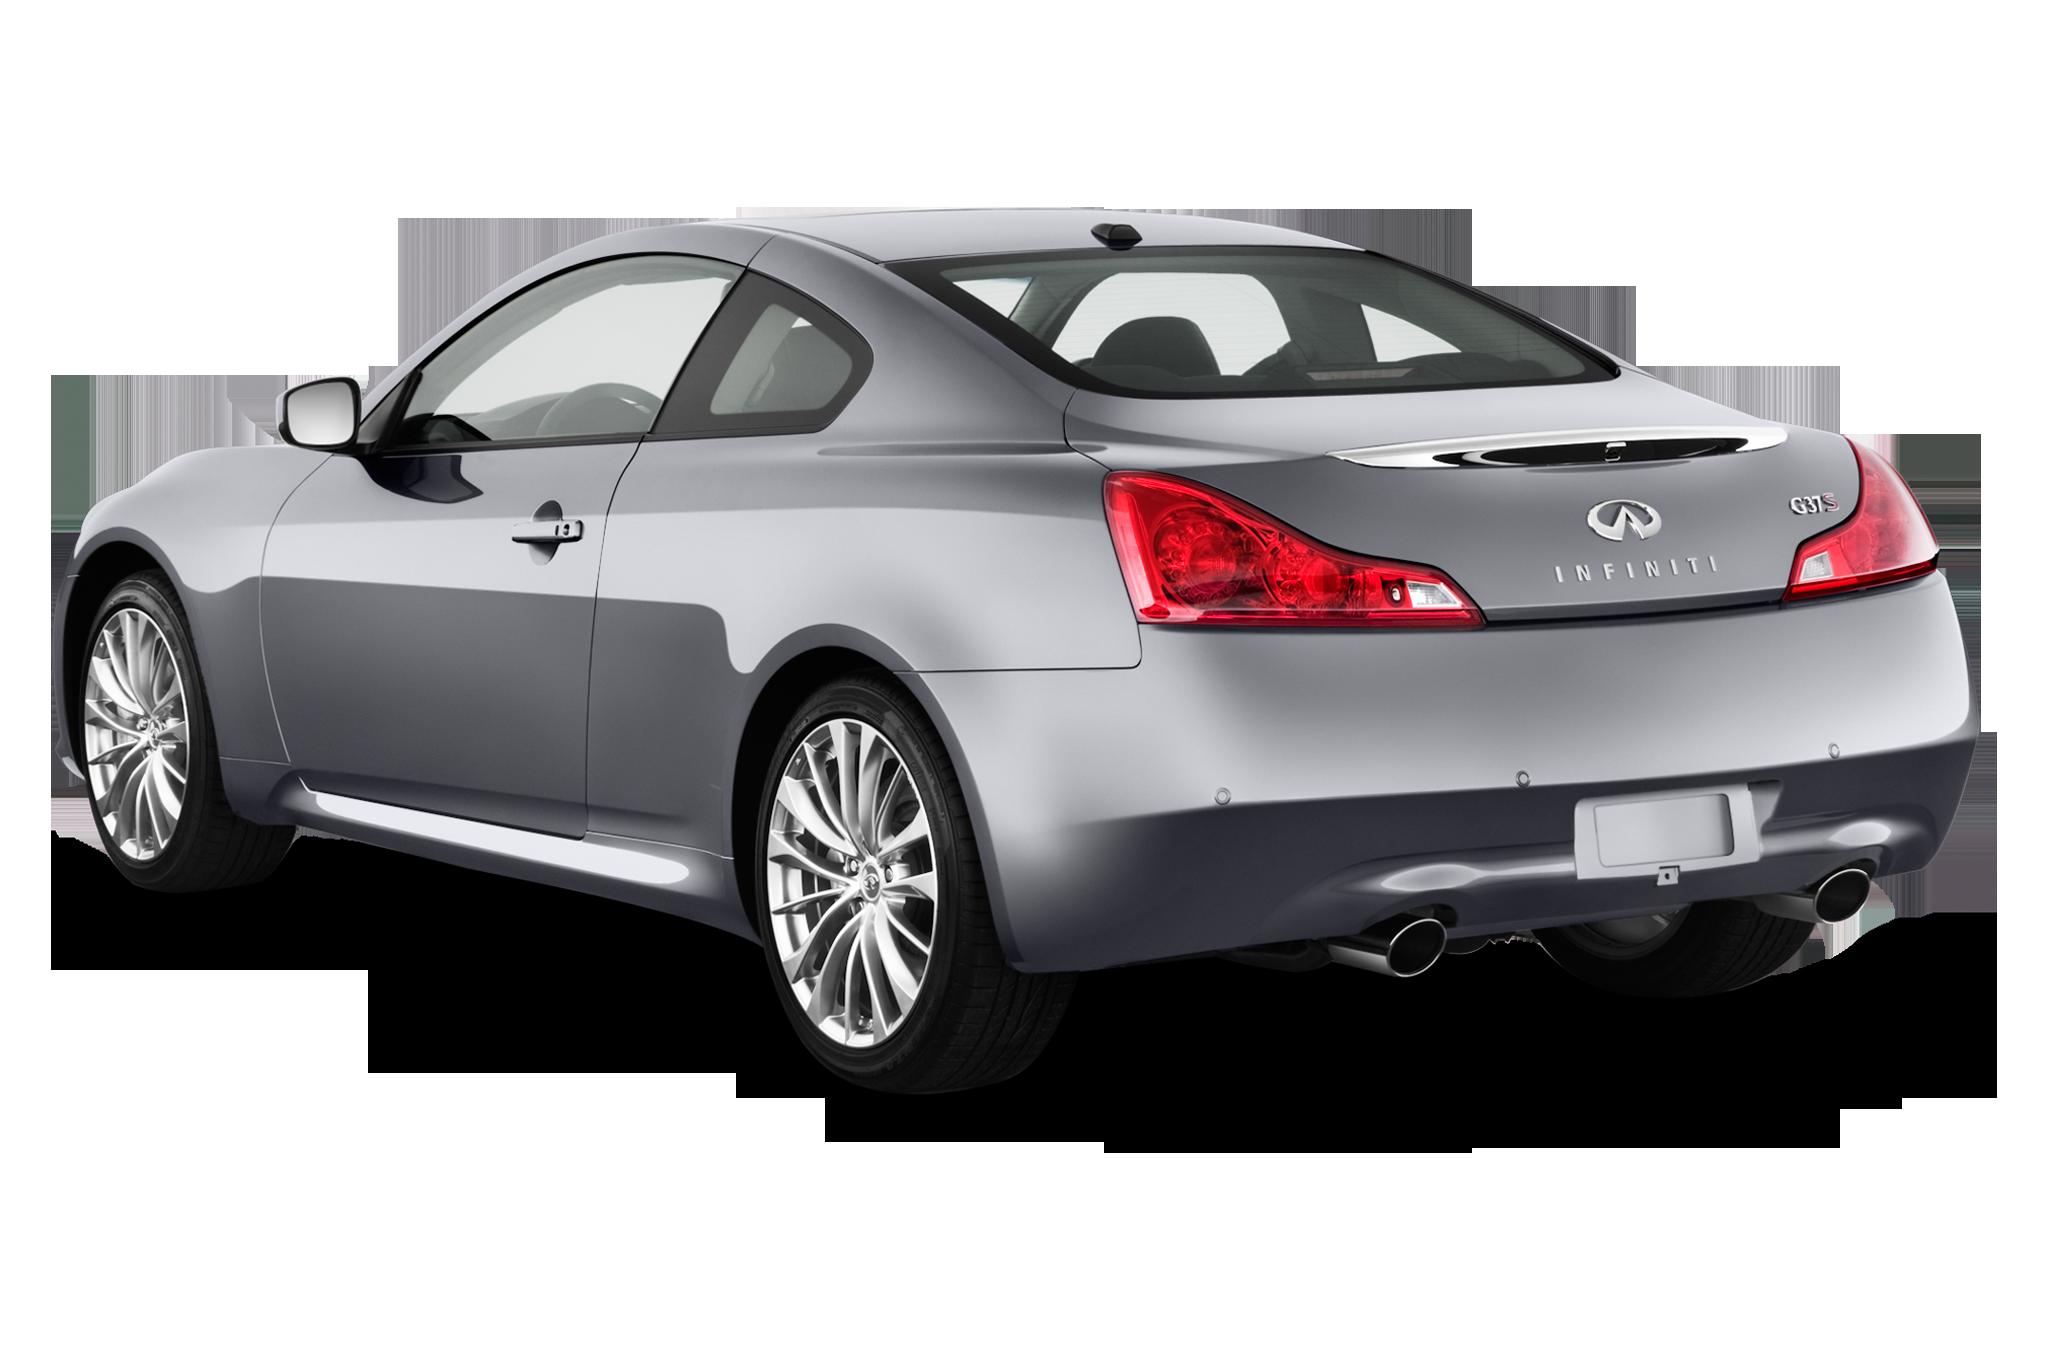 beach fl infiniti hallandale inventory car infinity at best price journey sedan details in sale for dealer